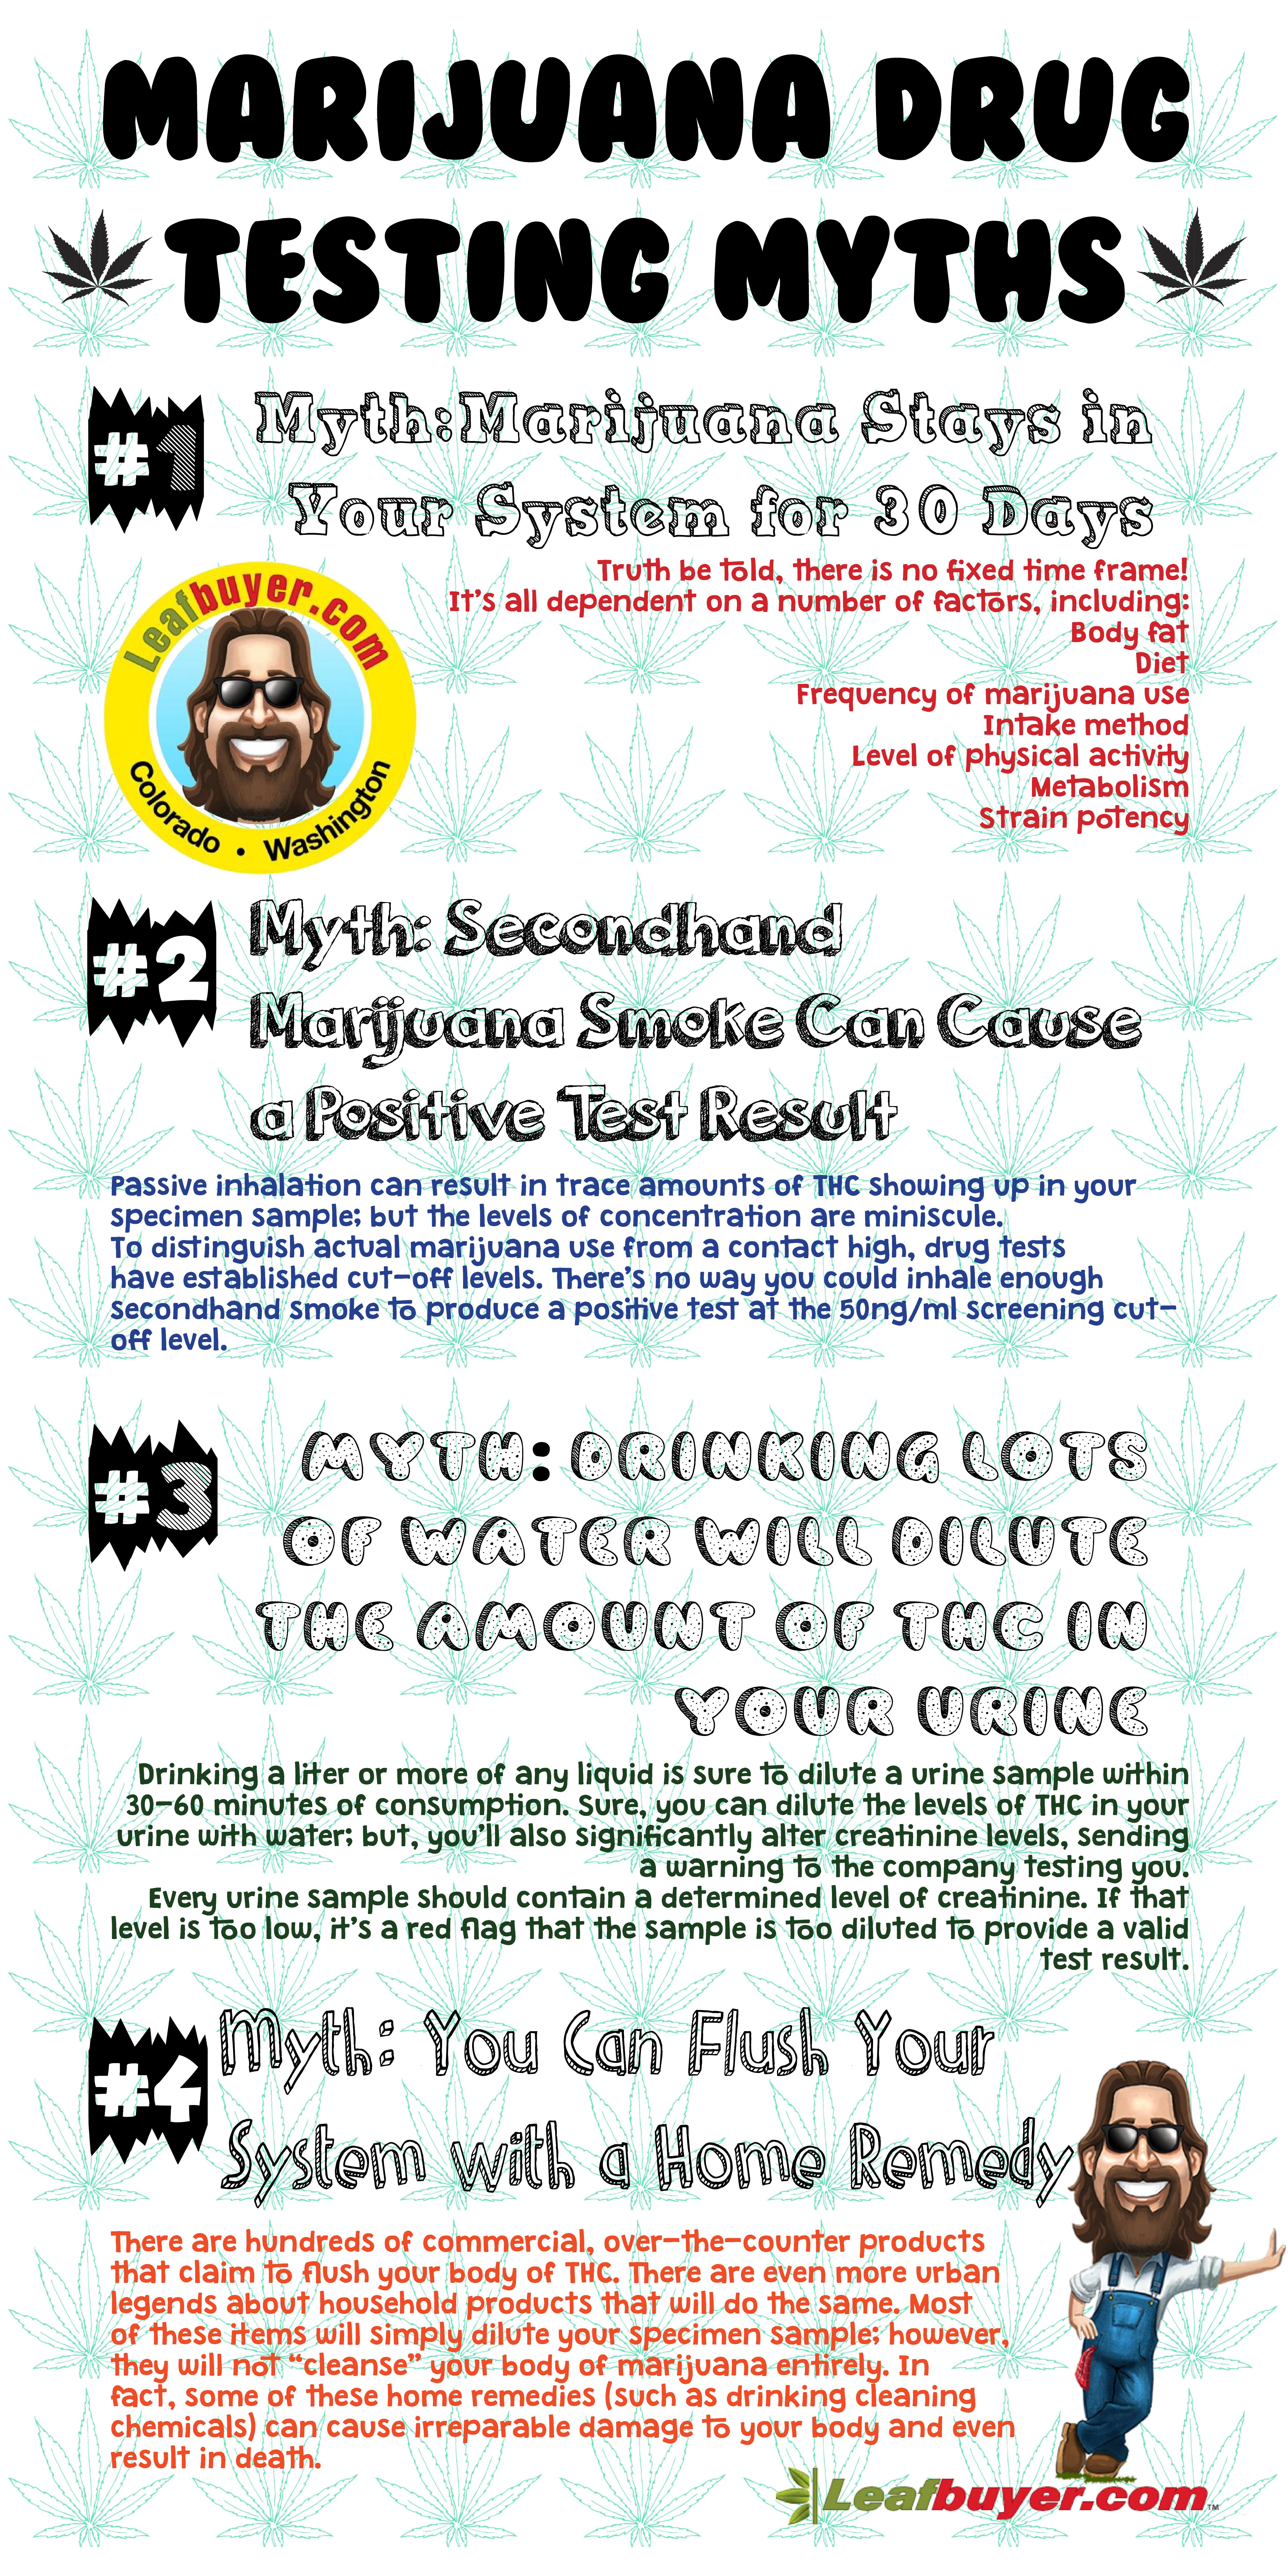 infographic marijuana drug testing myths leafbuyer marijuana drug testing myths infographic